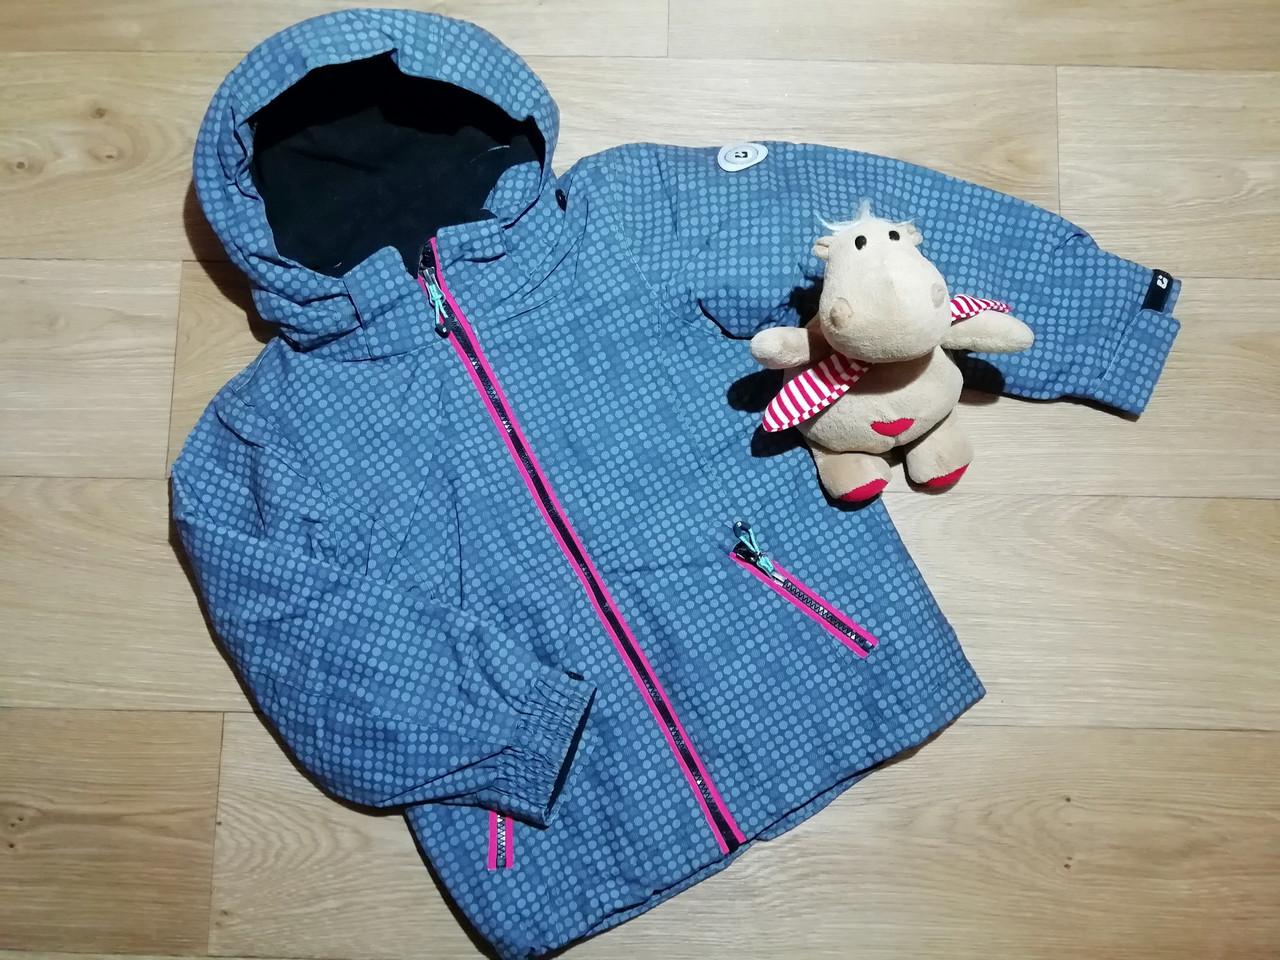 Теплая зимняя куртка на девочку Killtec (США) (Размер 6Т)